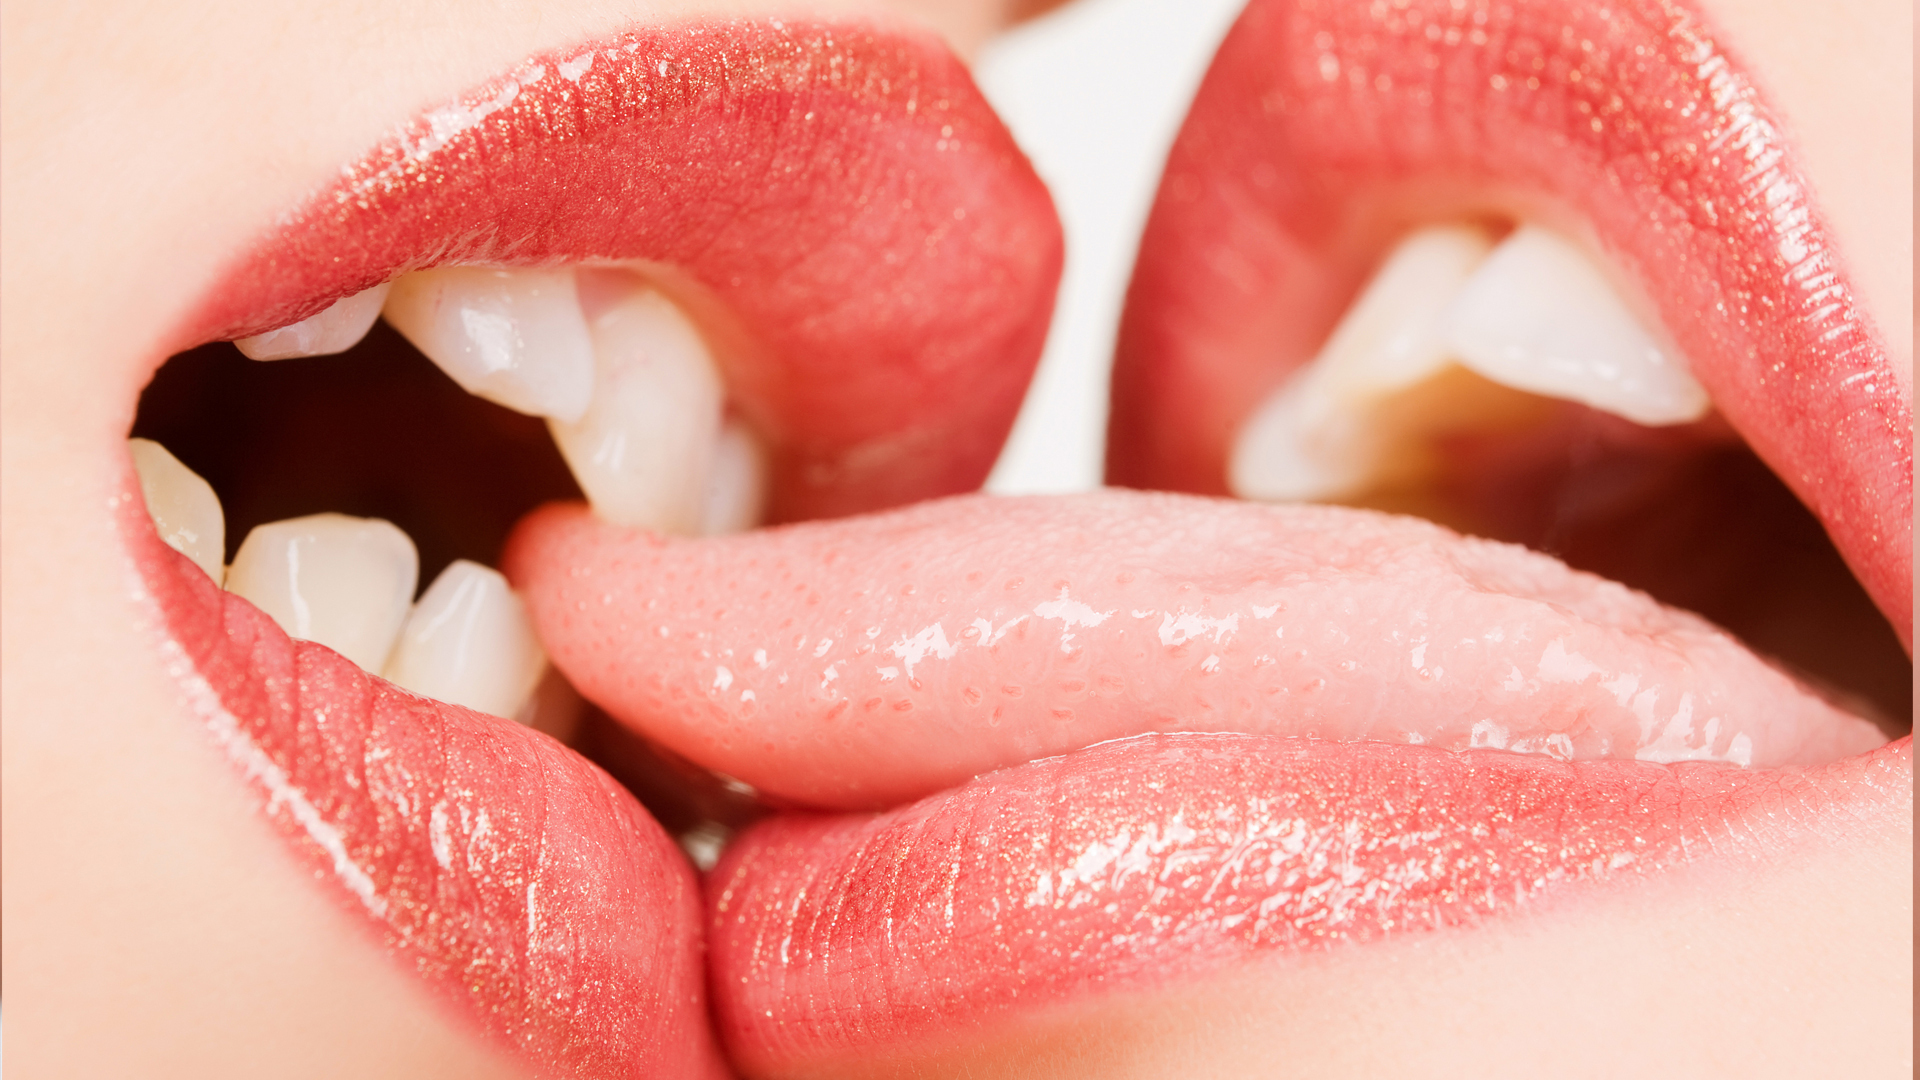 European MILF lesbians Sapphire and Cherry Blush tongue meaty labia lips № 712809 загрузить